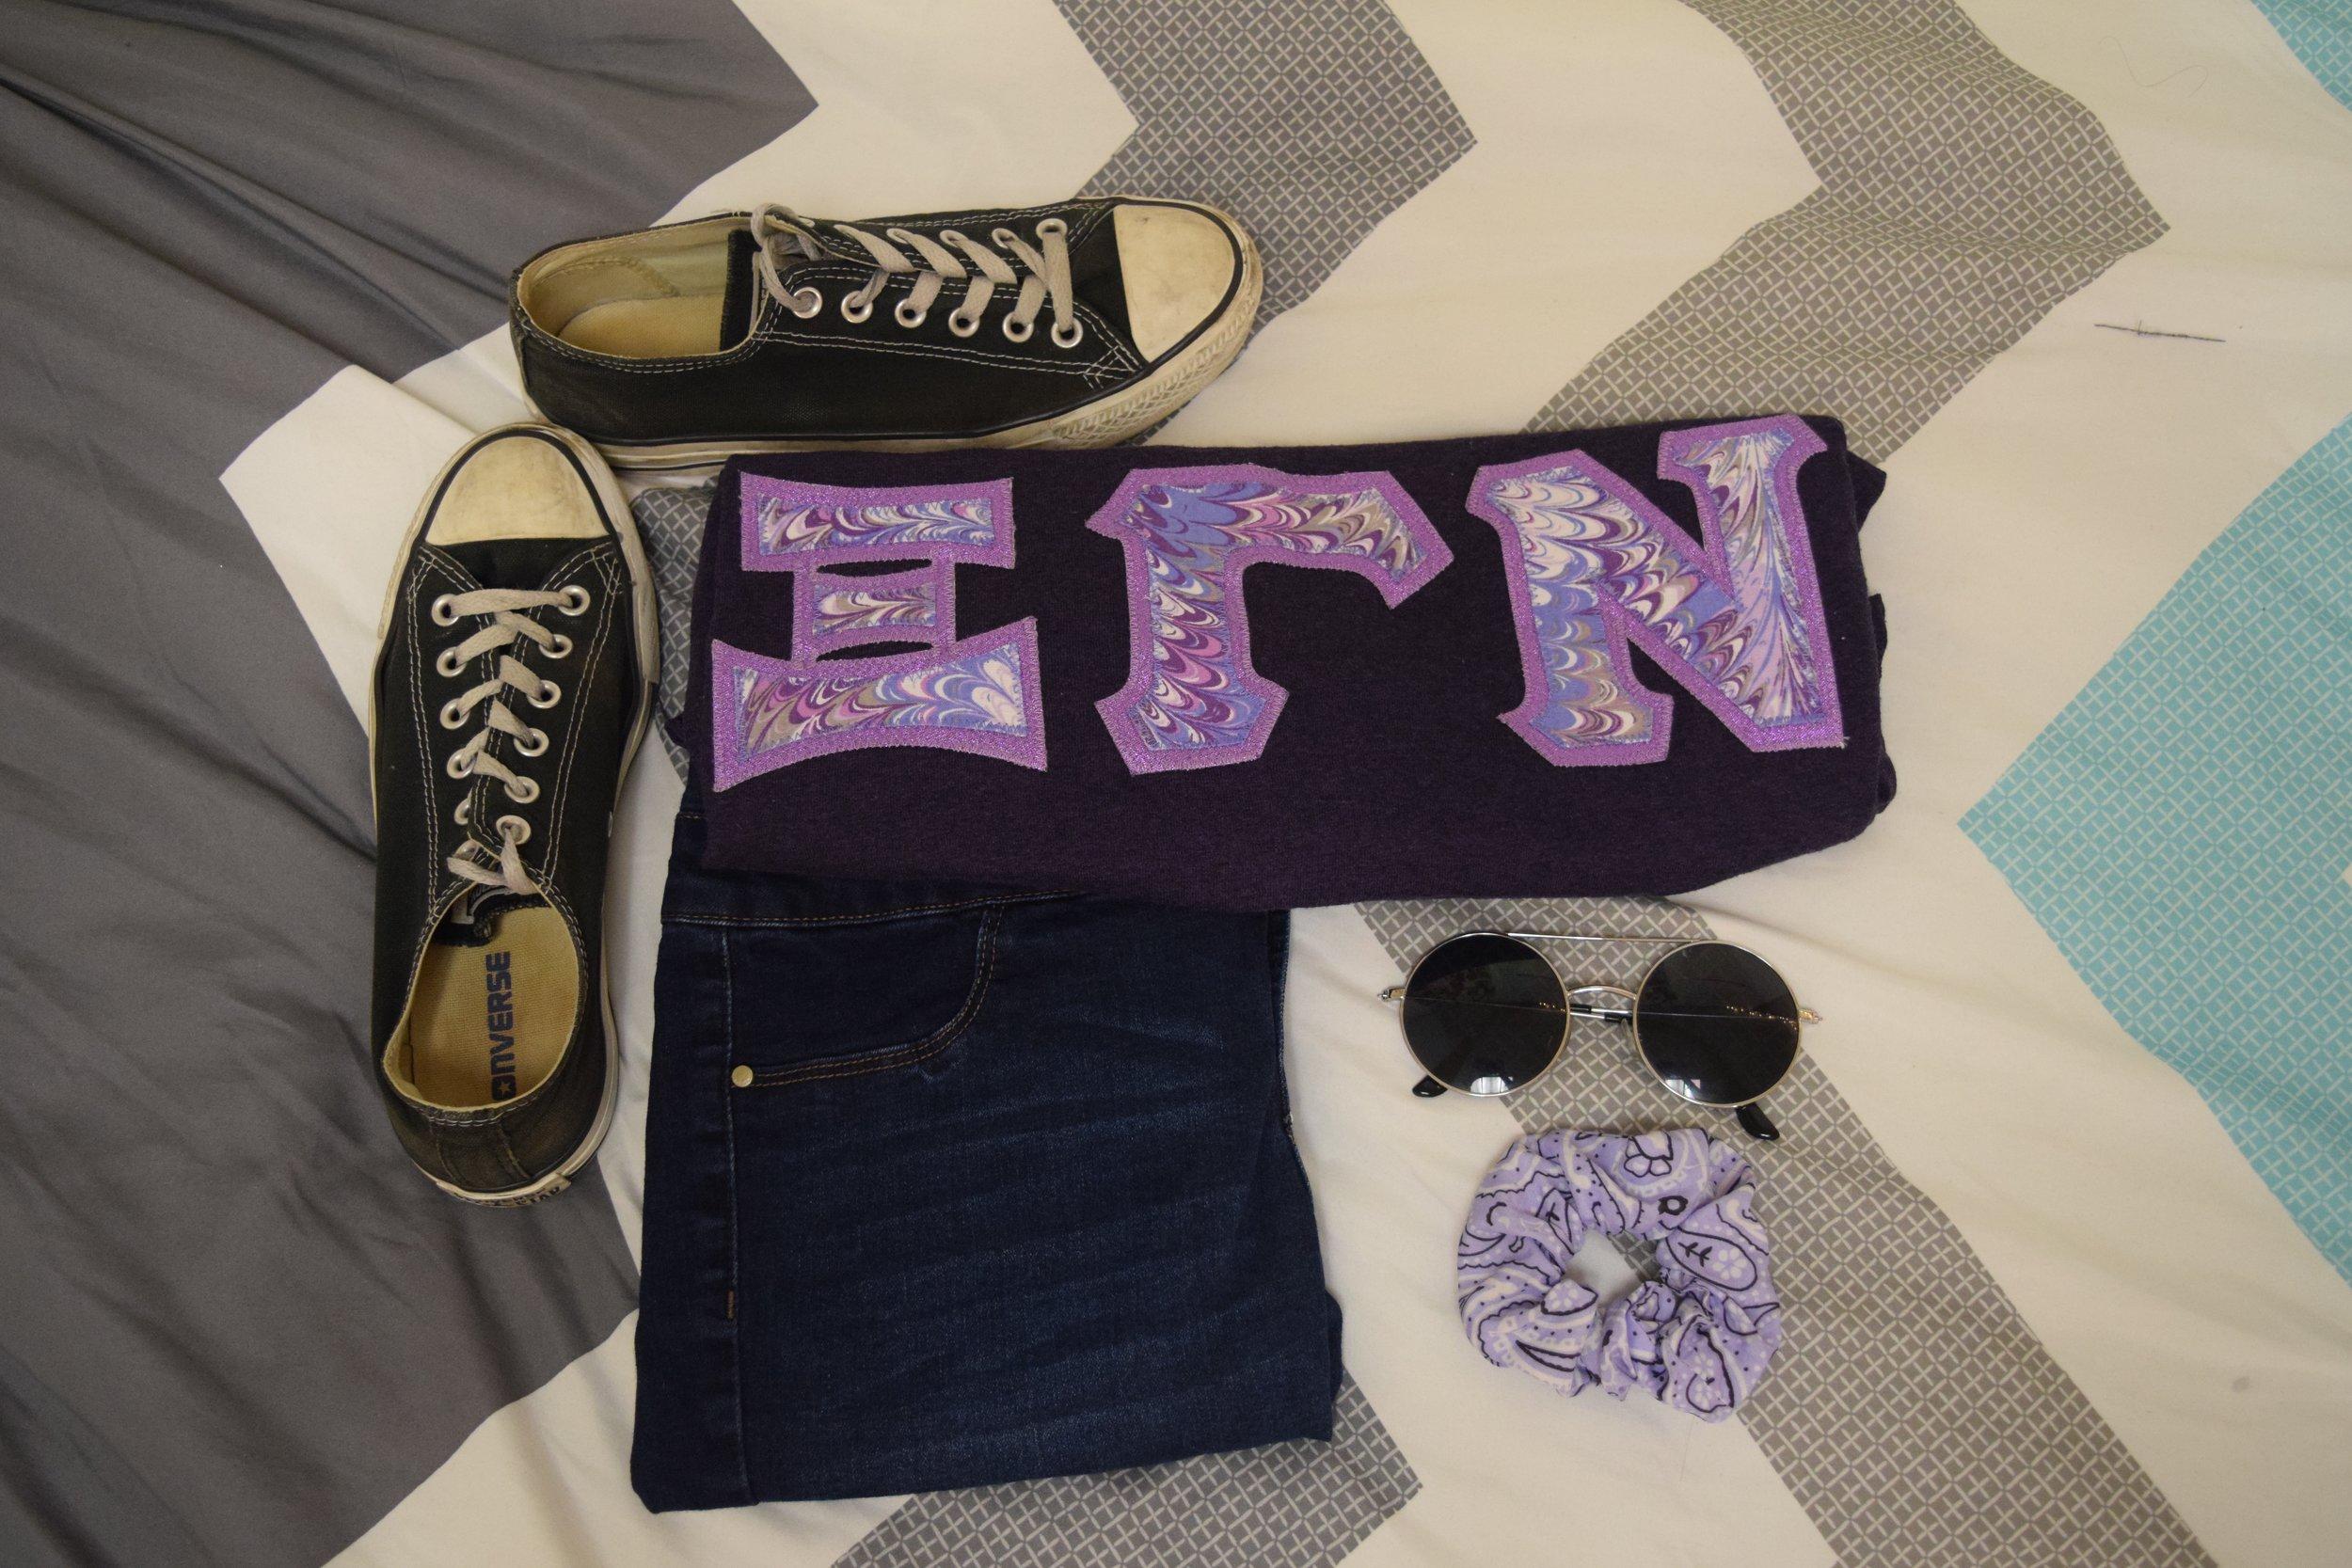 Shirt .  Jeans .  Sneakers .  Sunglasses  (similar).  Scrunchie .